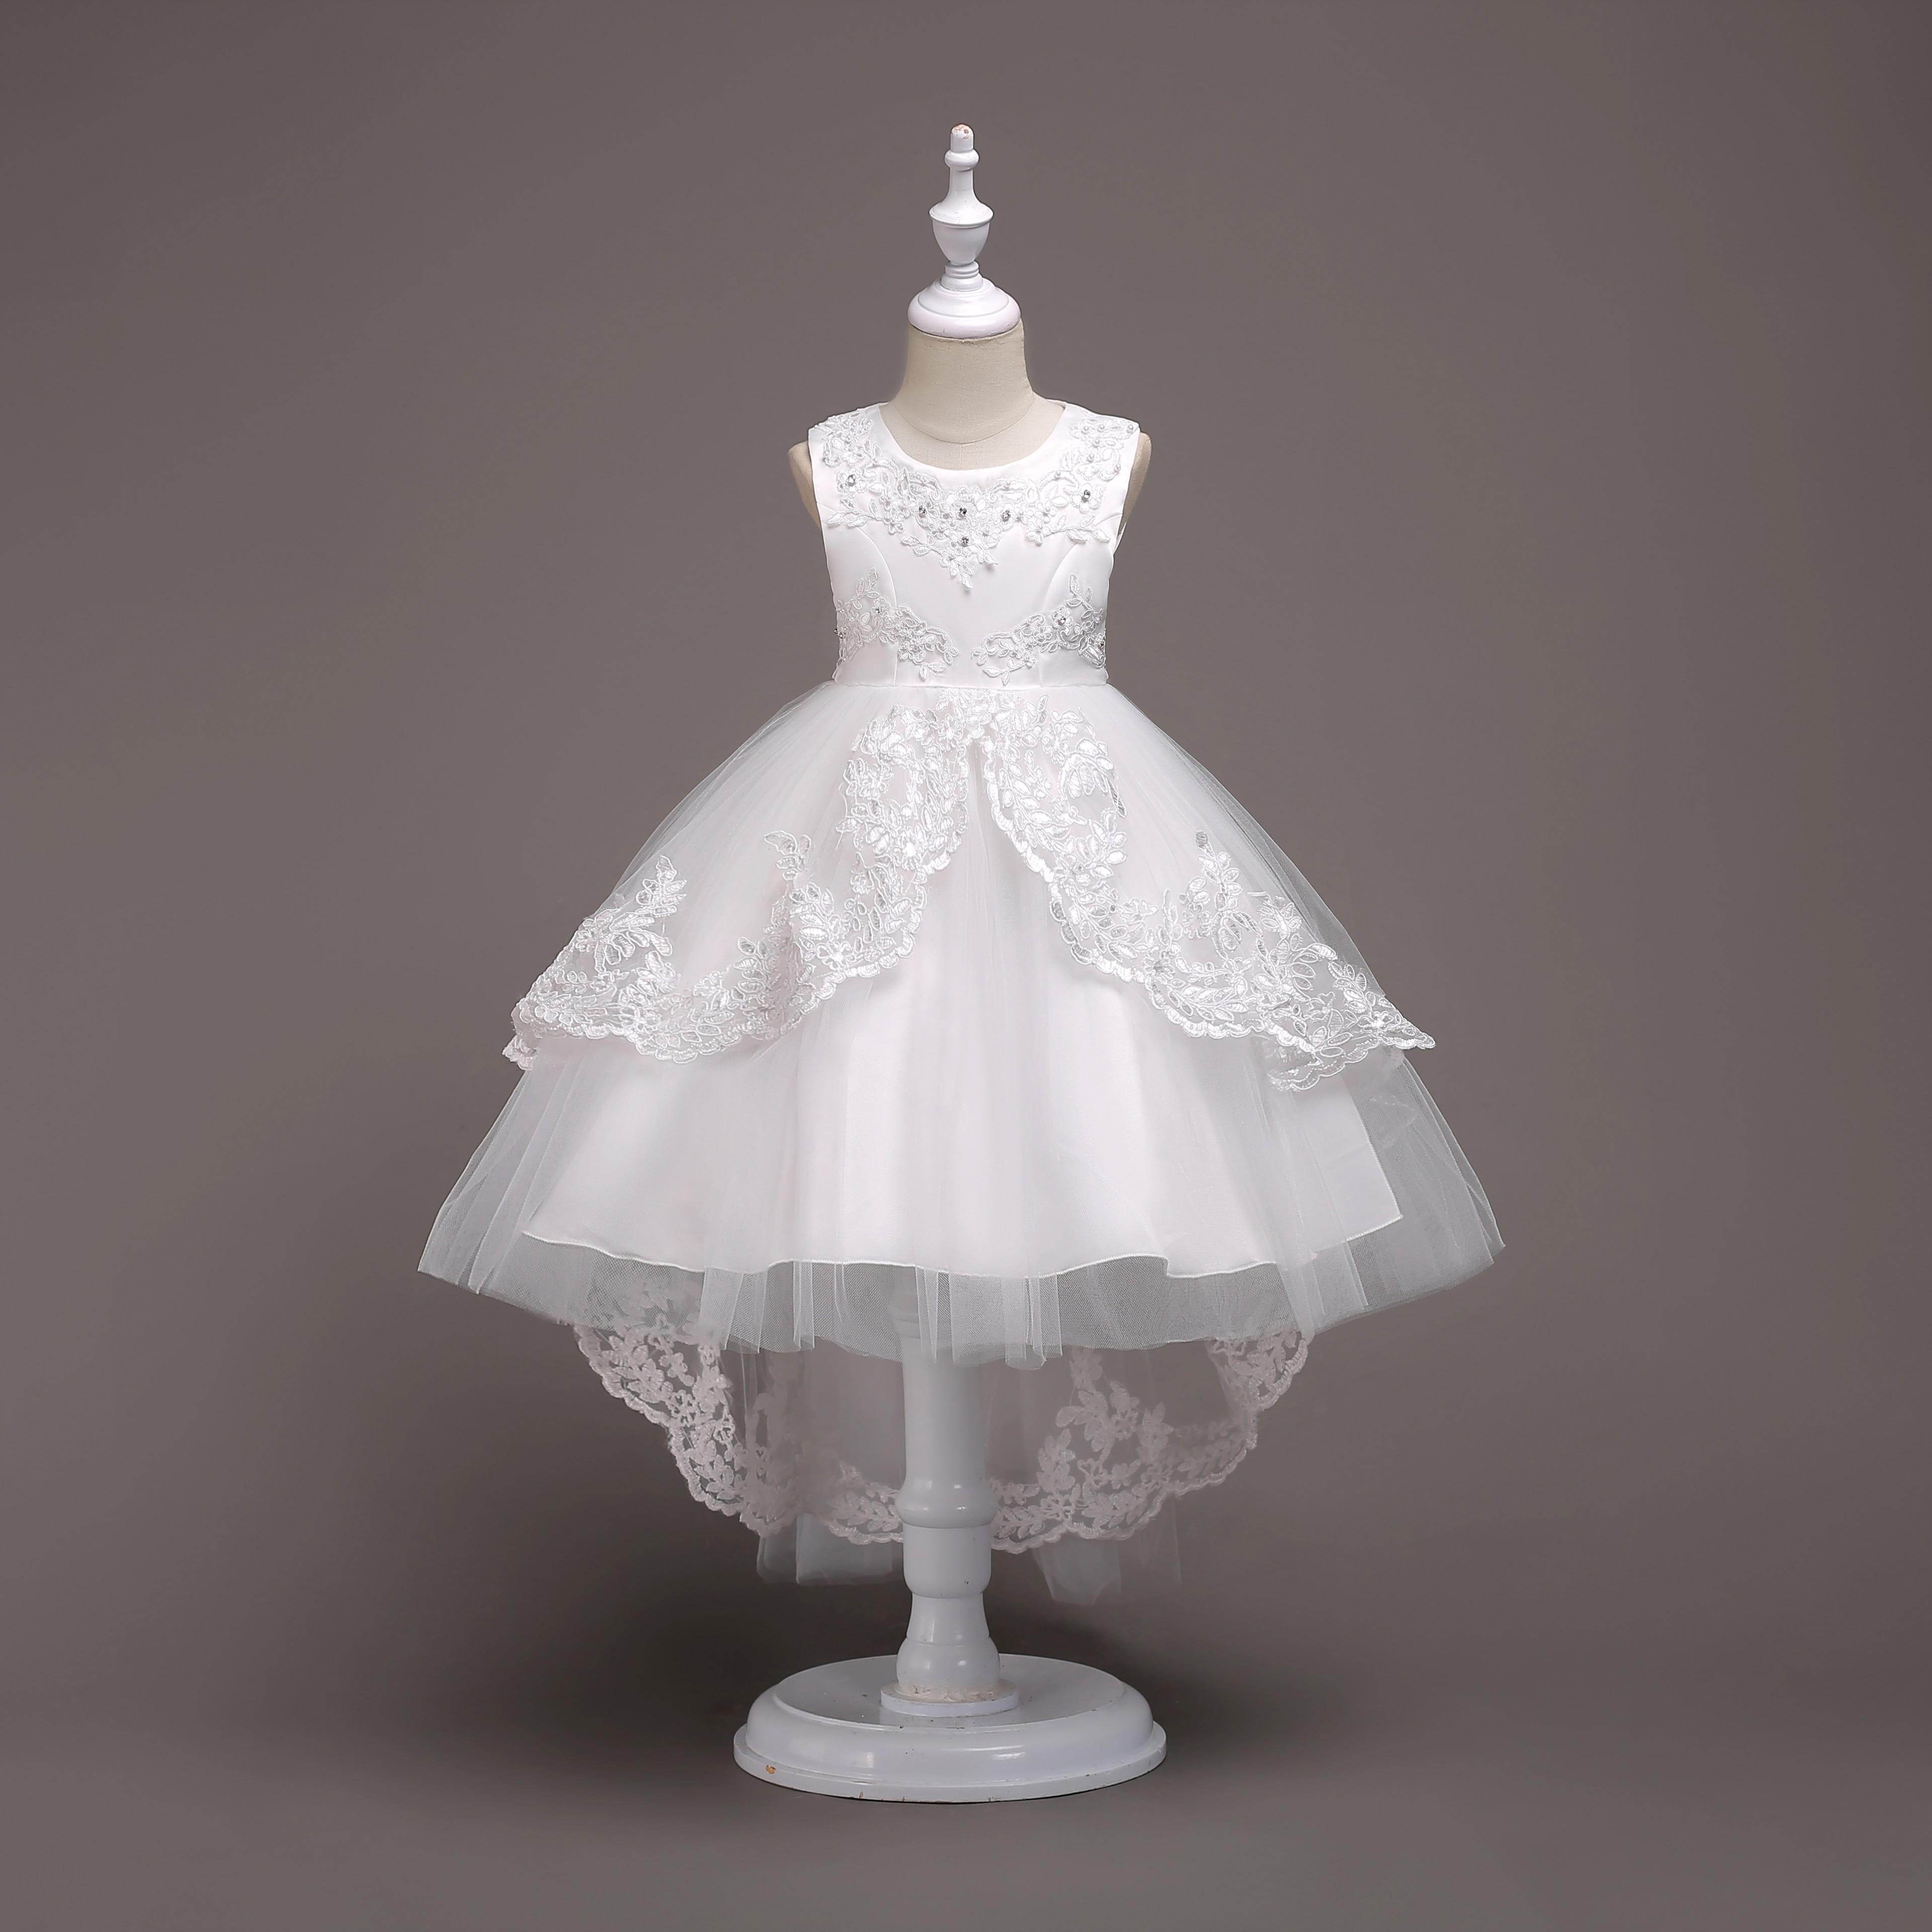 Girl High Low Lace Appliques Communion Dresses Flower Wedding Party Princess Dress